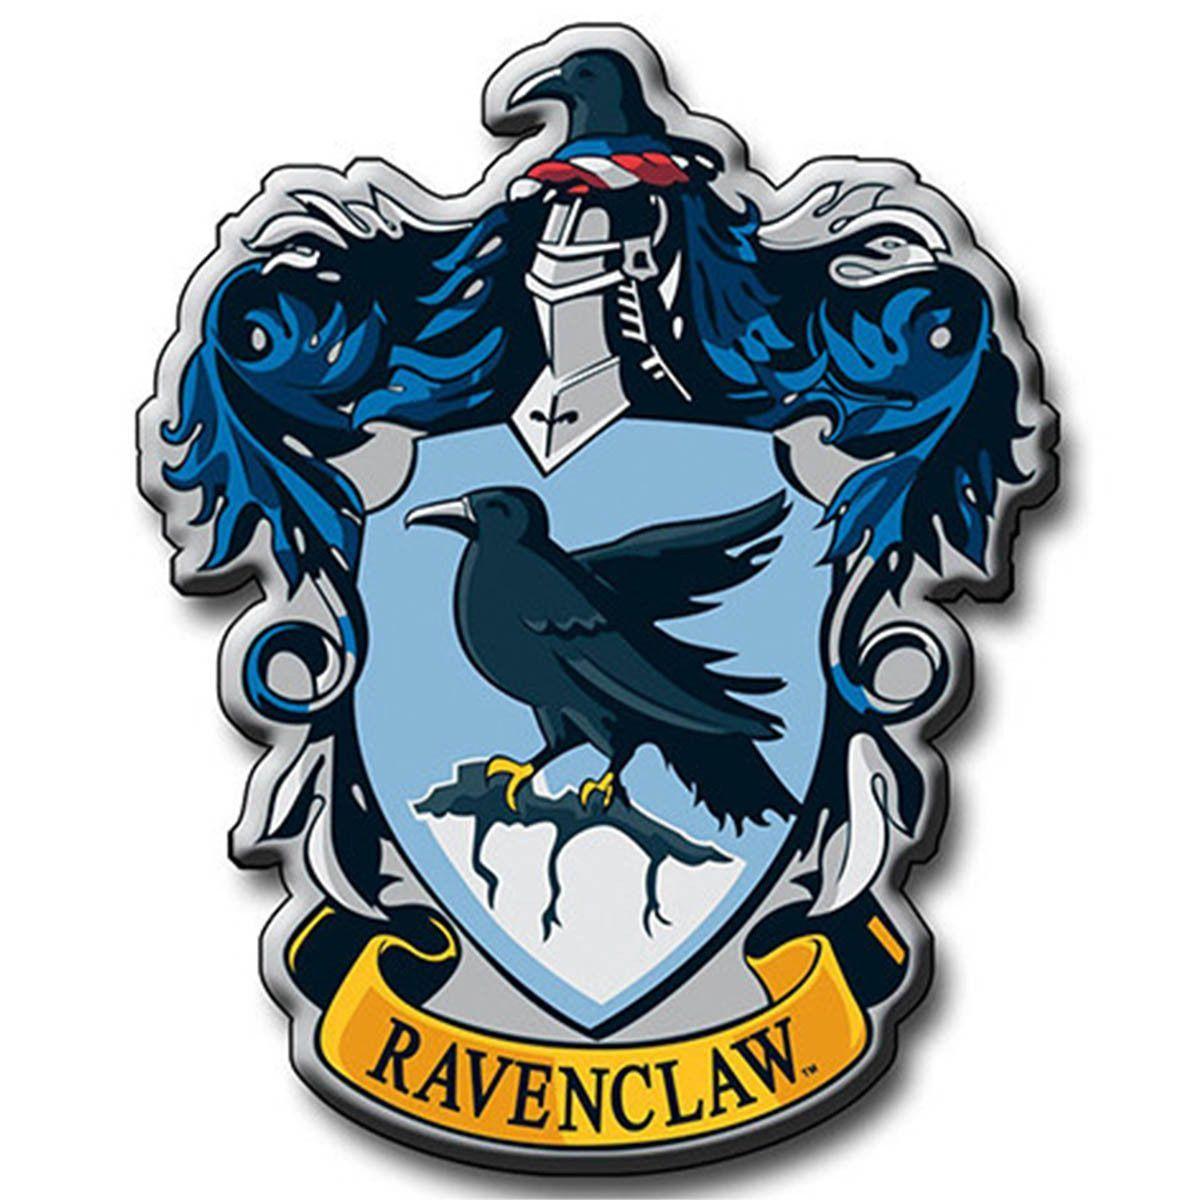 Ravenclaw Logo Wallpaper 2021 Live Wallpaper Hd Festa Harry Potter Decoracao Harry Potter Corvinal